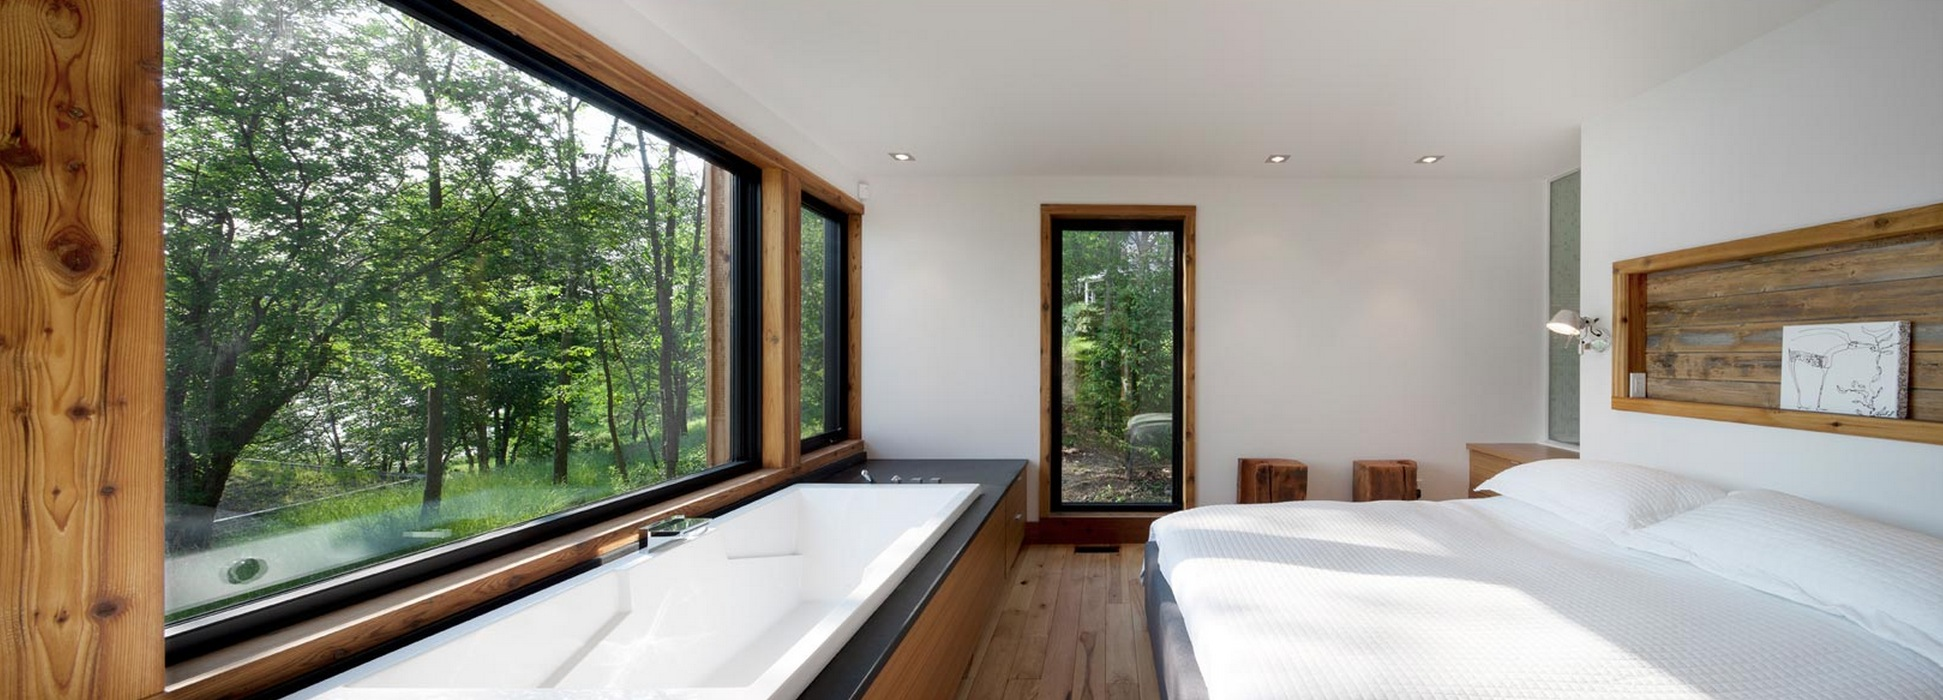 Residence-Massawippi-Huma-Design-Quebec-11